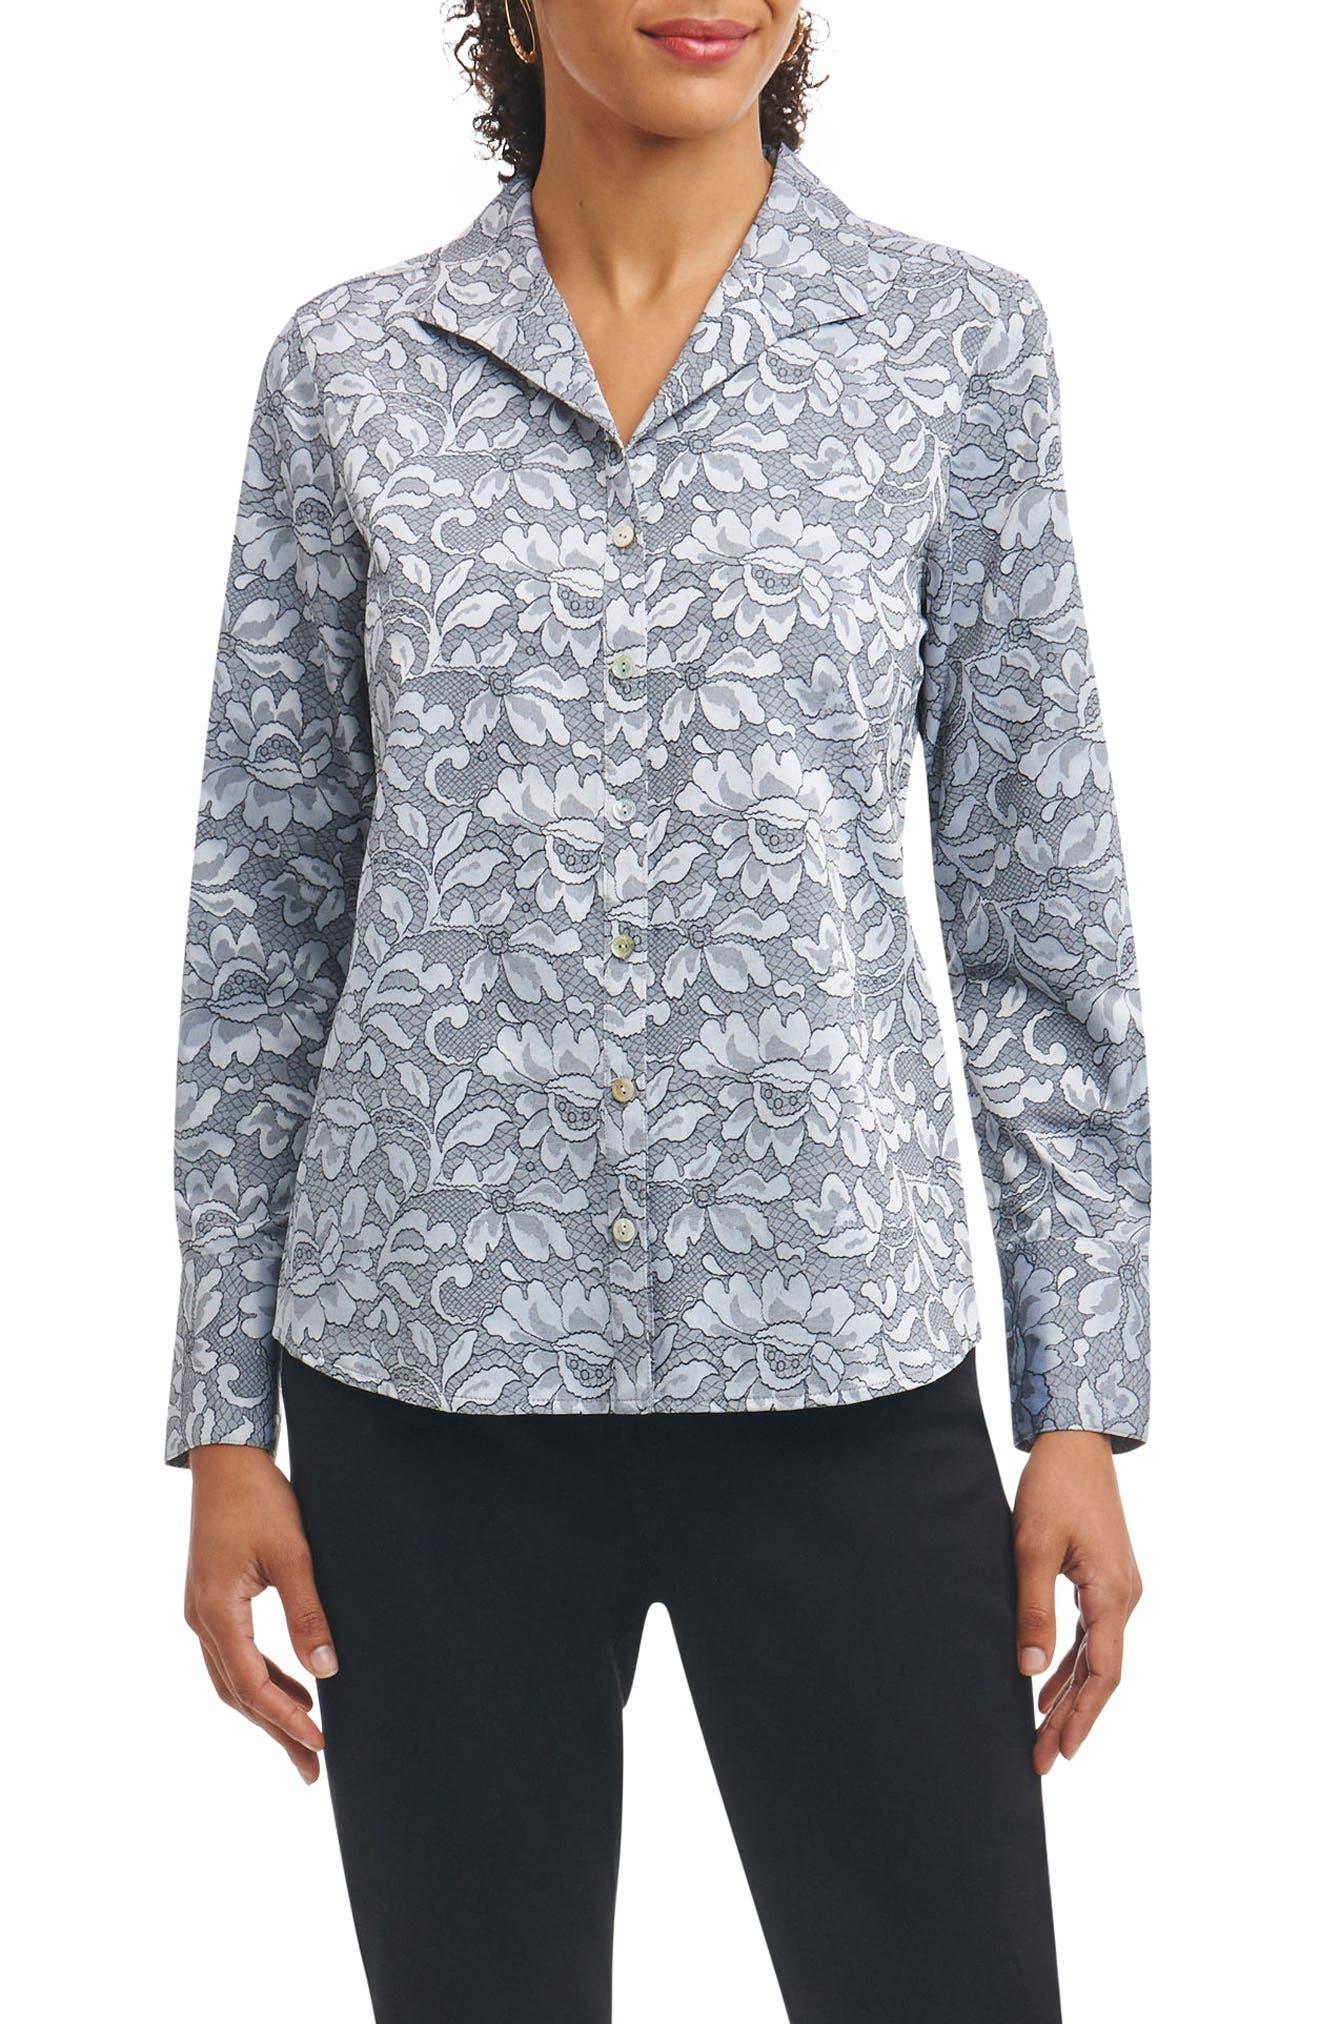 Main Image - Foxcroft Rhonda Wrinkle Free Lace Jacquard Shirt